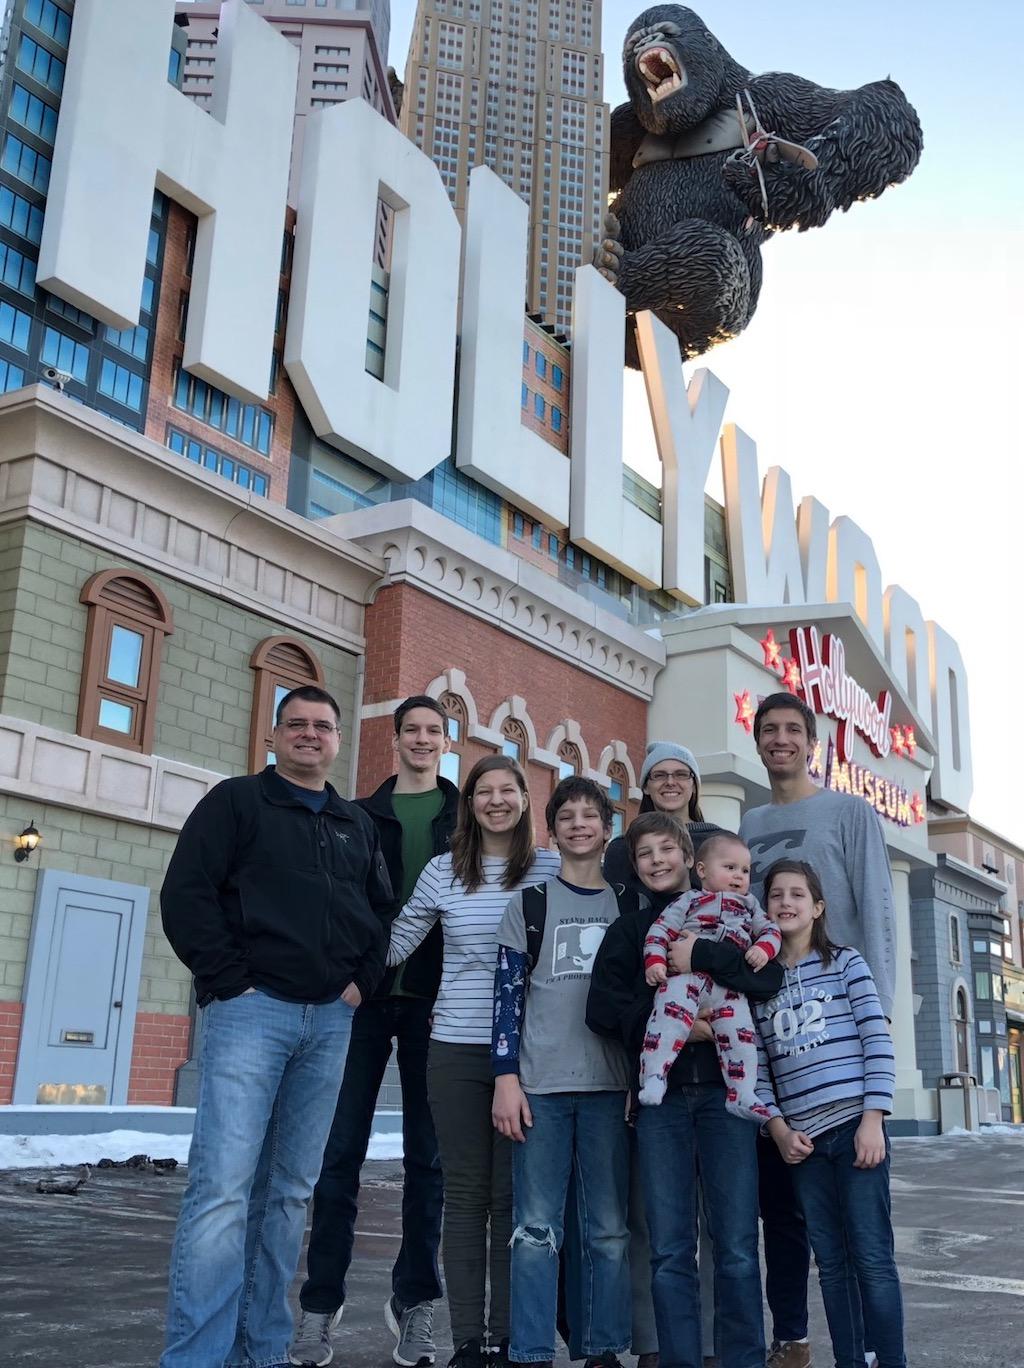 Hollywood Wax Museum in Branson, Missouri